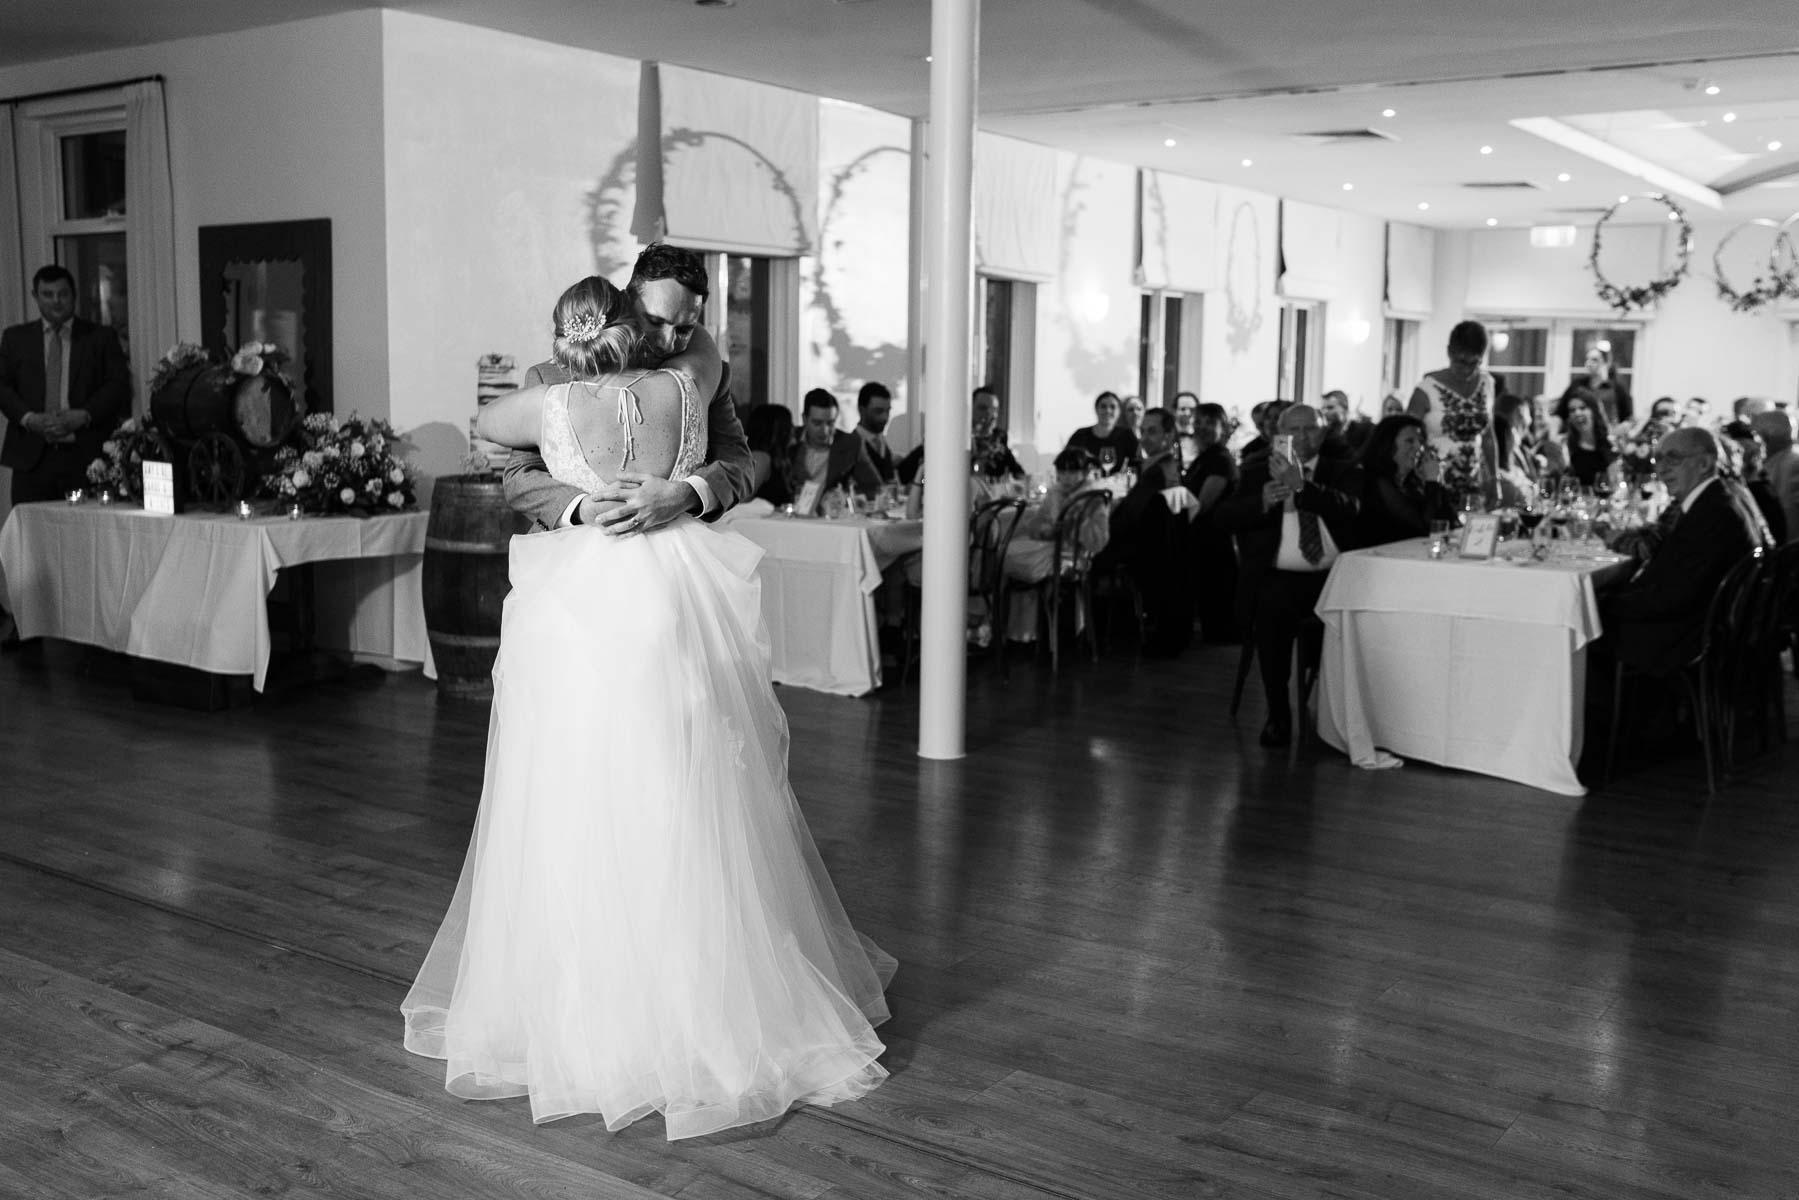 lindenderry-wedding-heart+soul-weddings-amy-alain-03920.jpg